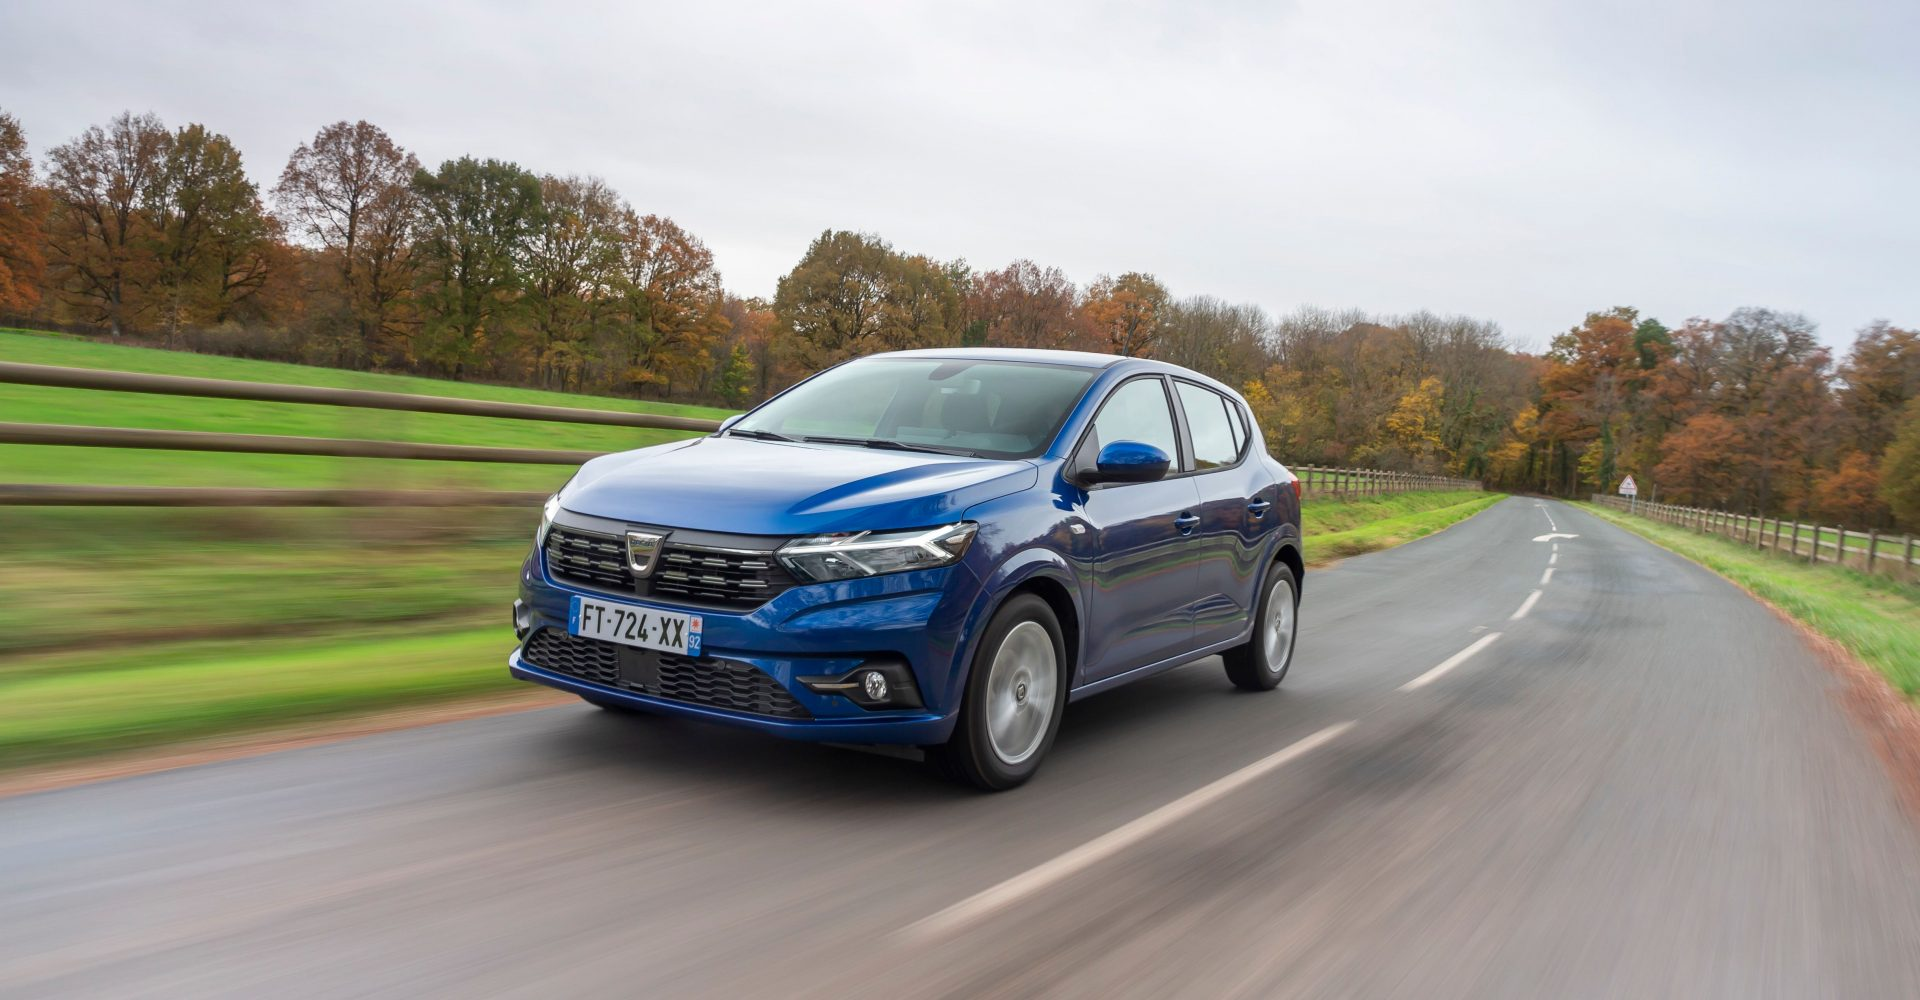 Dacia Sandero takes the crown as 2021 WhatCar? Car of the Year